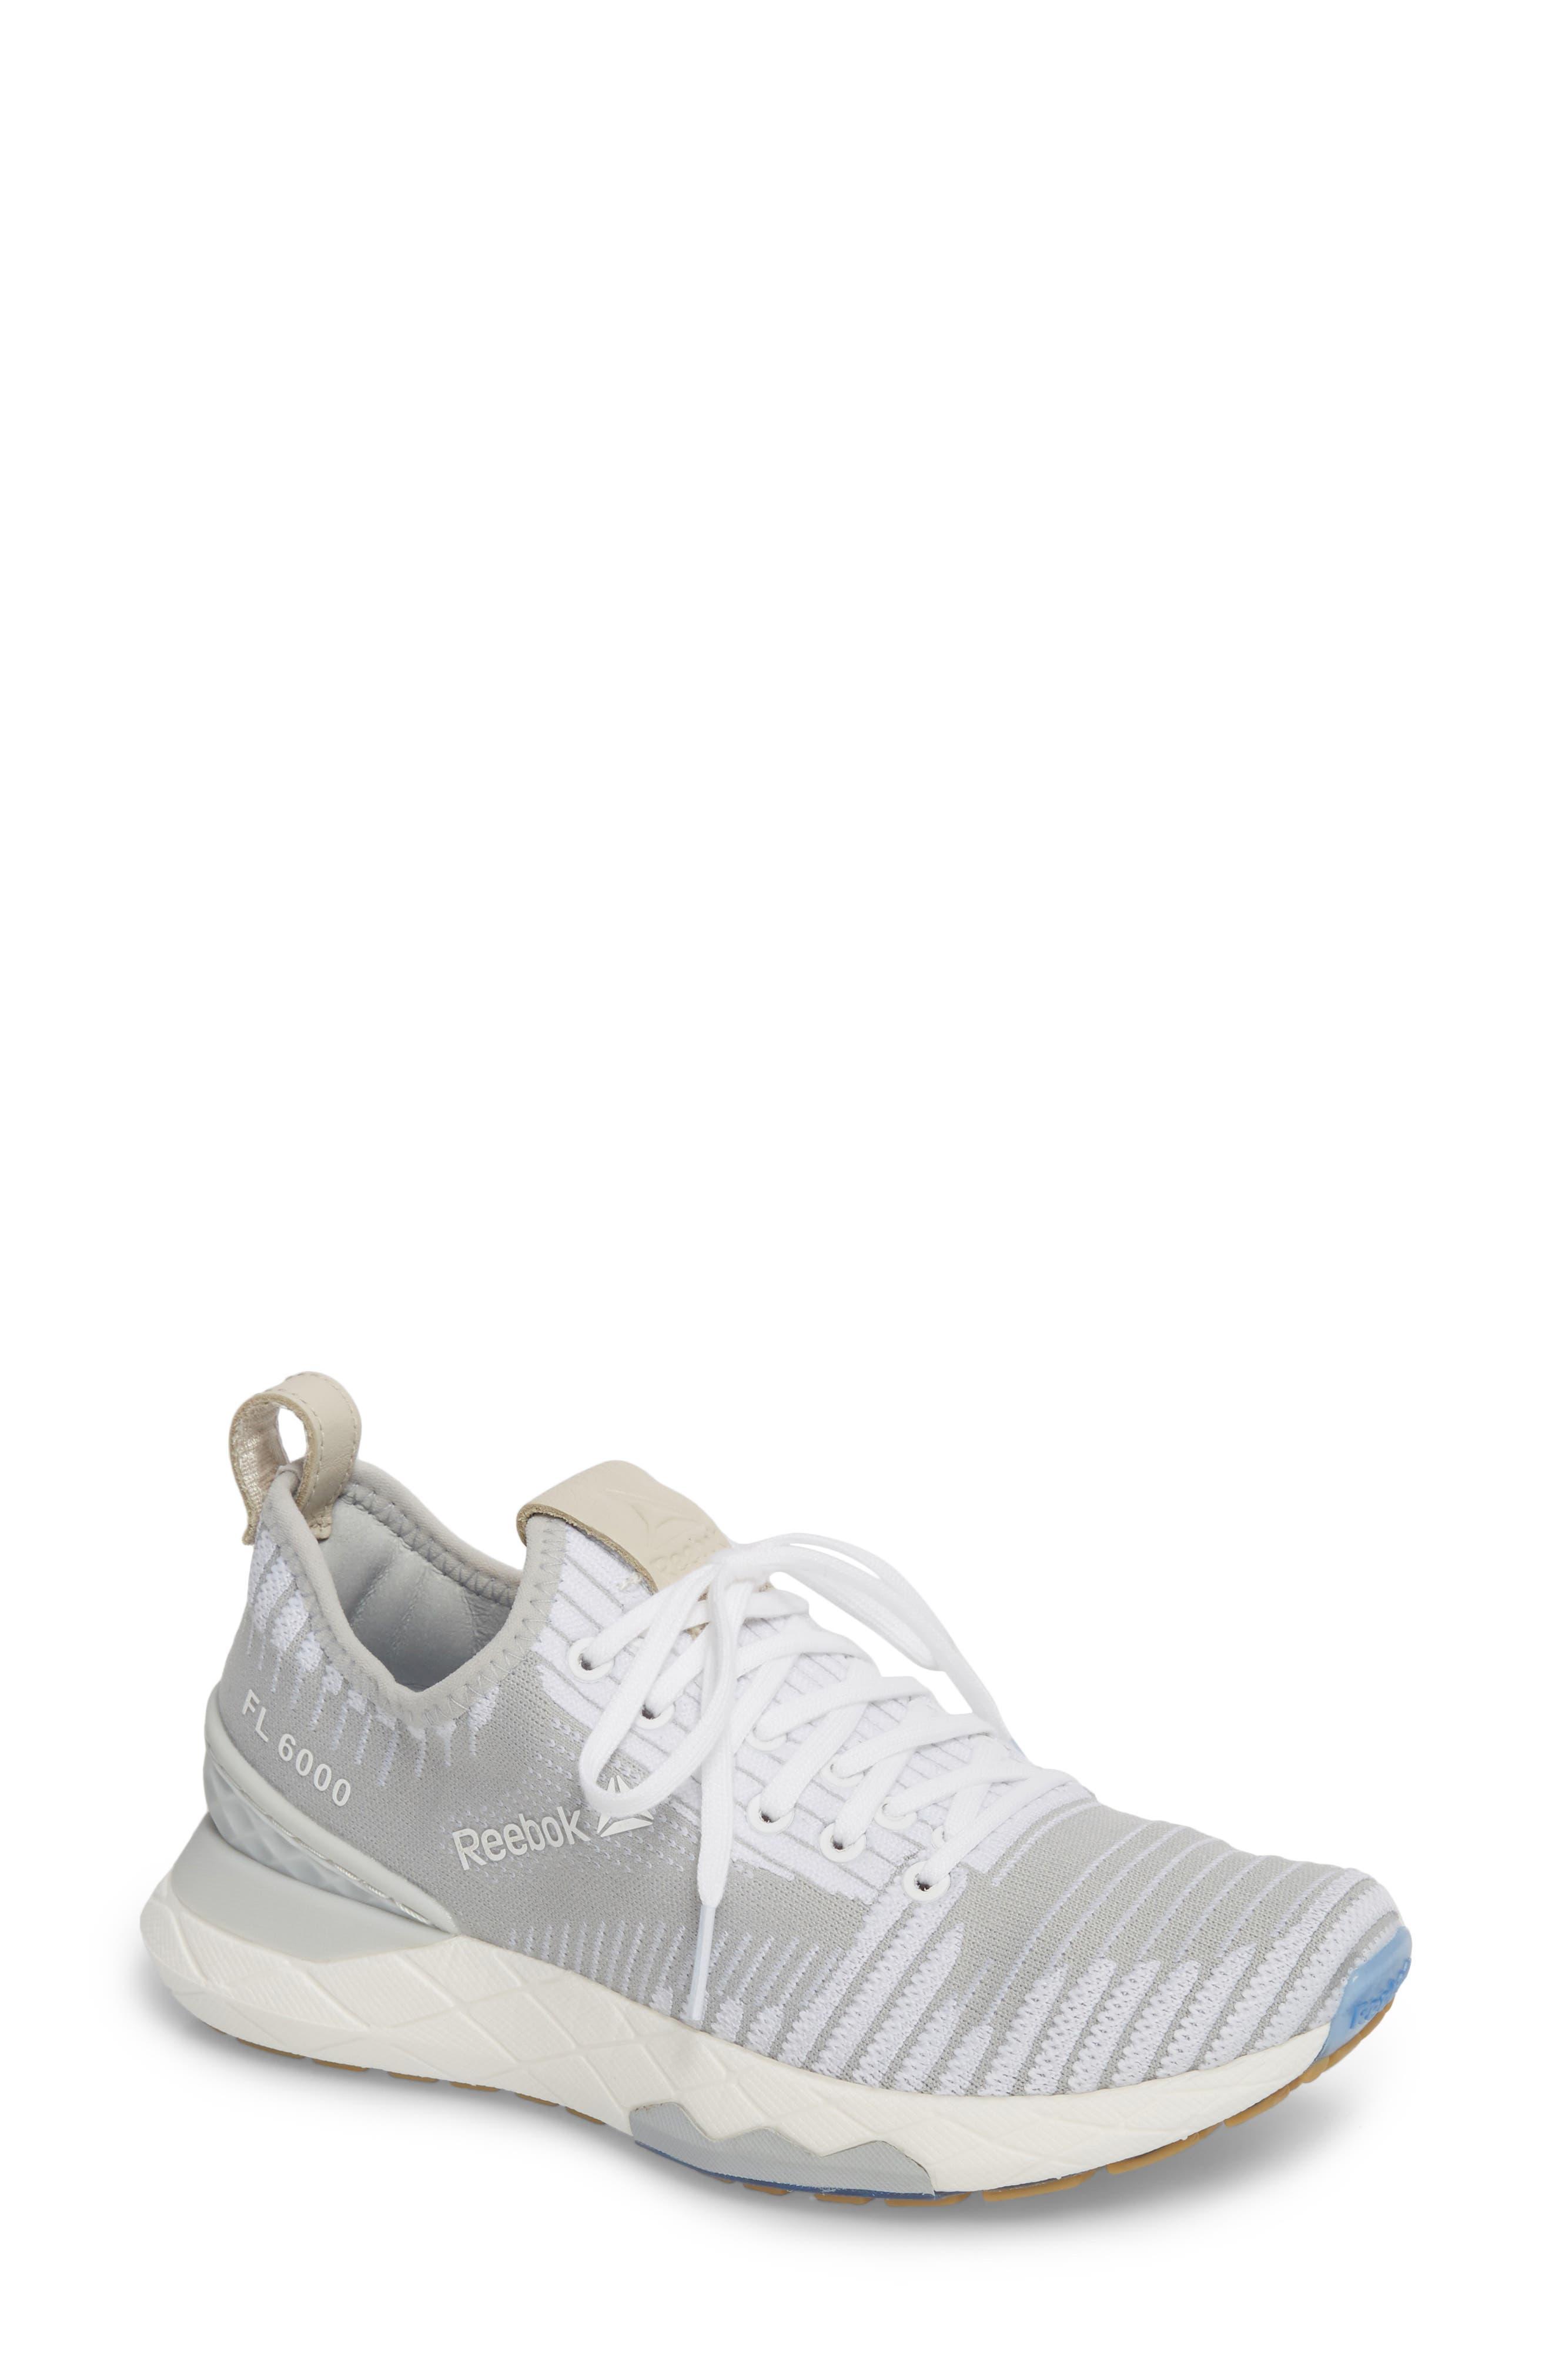 Floatride 6000 Running Shoe,                             Main thumbnail 1, color,                             White/ Skull Grey